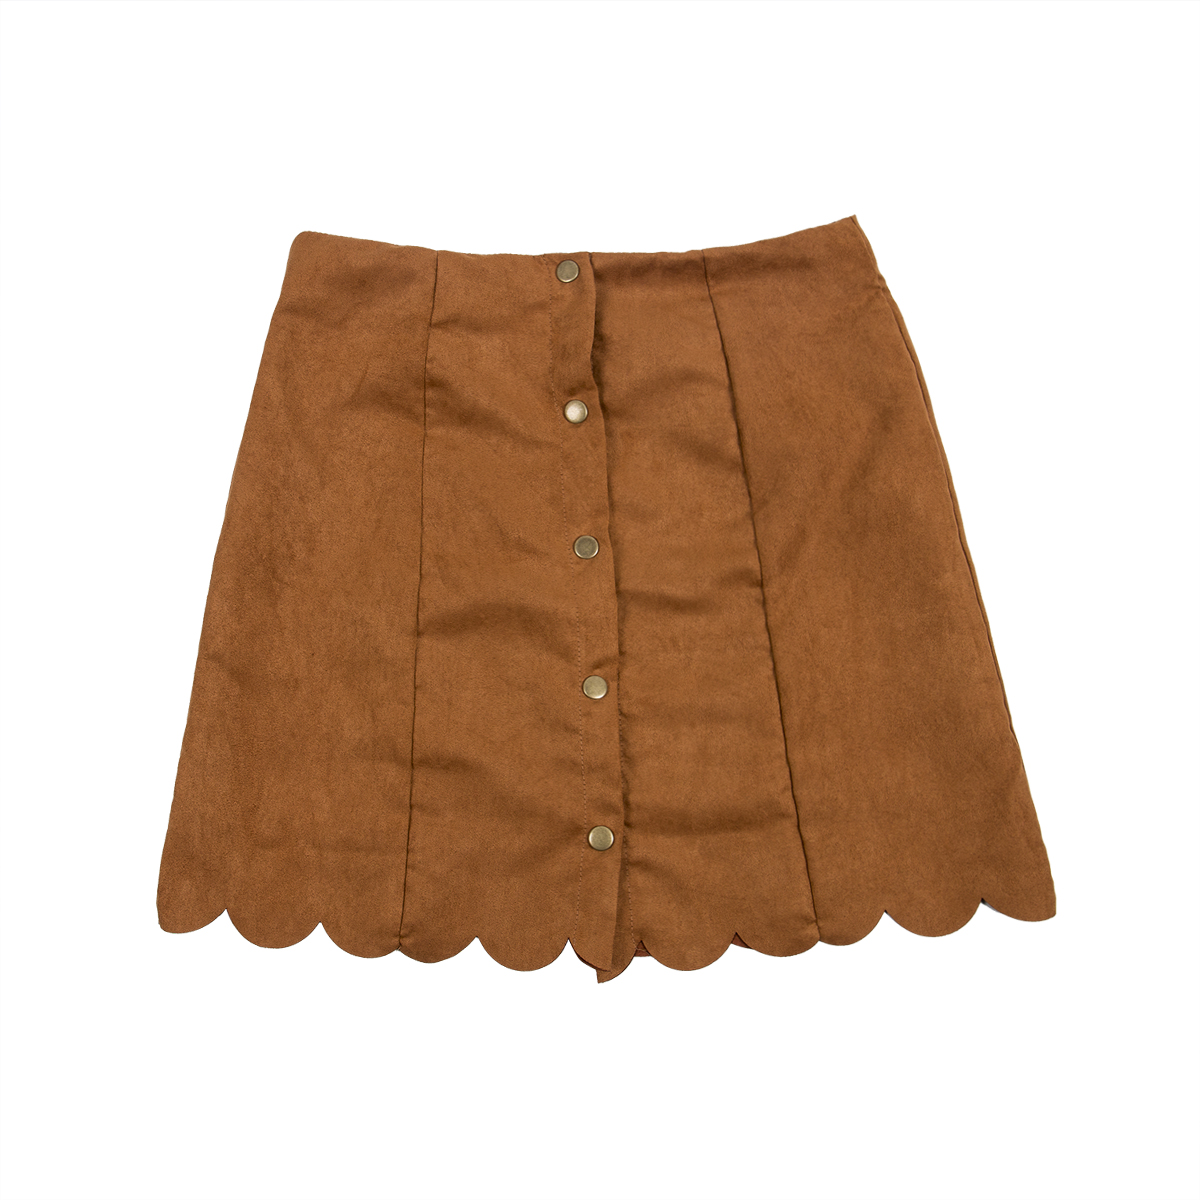 Women Elastic Pleated Solid Skirt High Waist Bodycon Mini Skirt Short A-Line Skirts